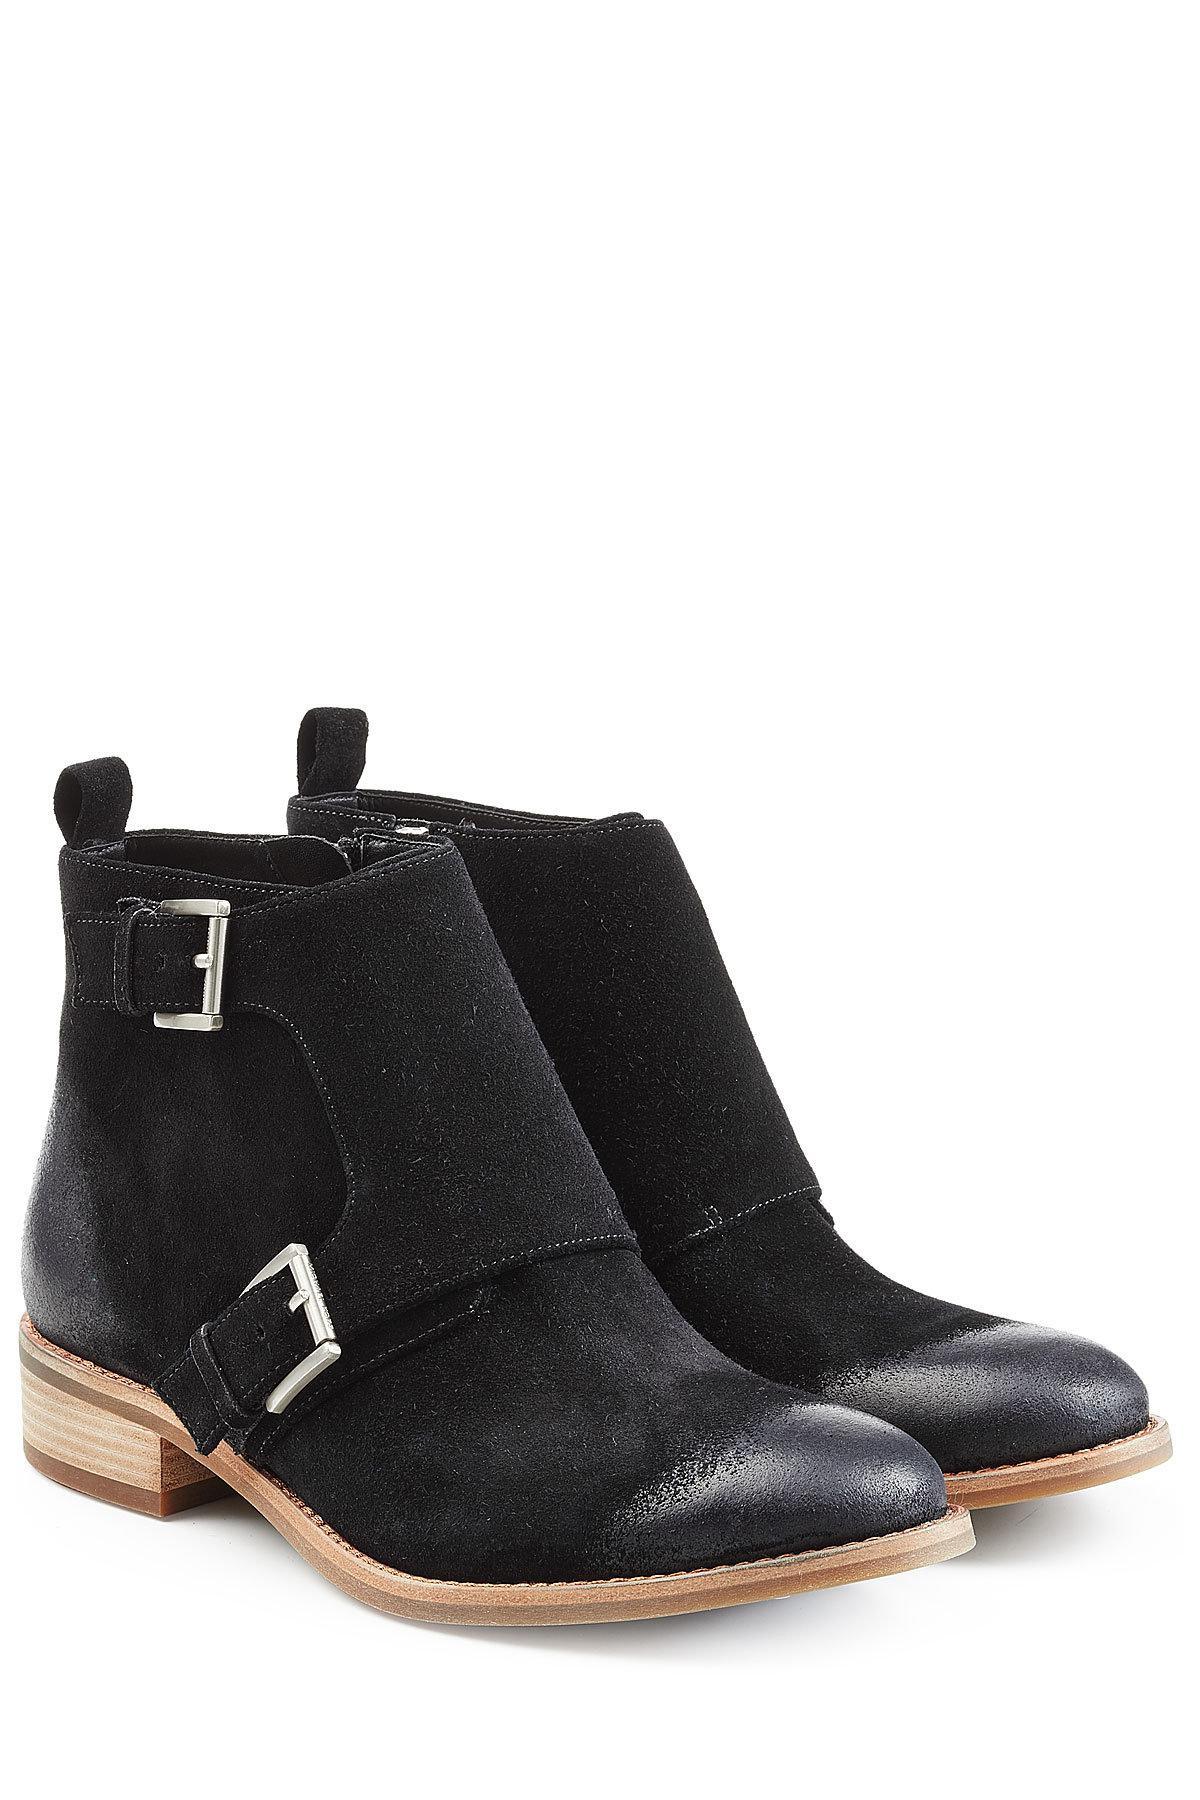 lyst michael michael kors suede ankle boots in black. Black Bedroom Furniture Sets. Home Design Ideas